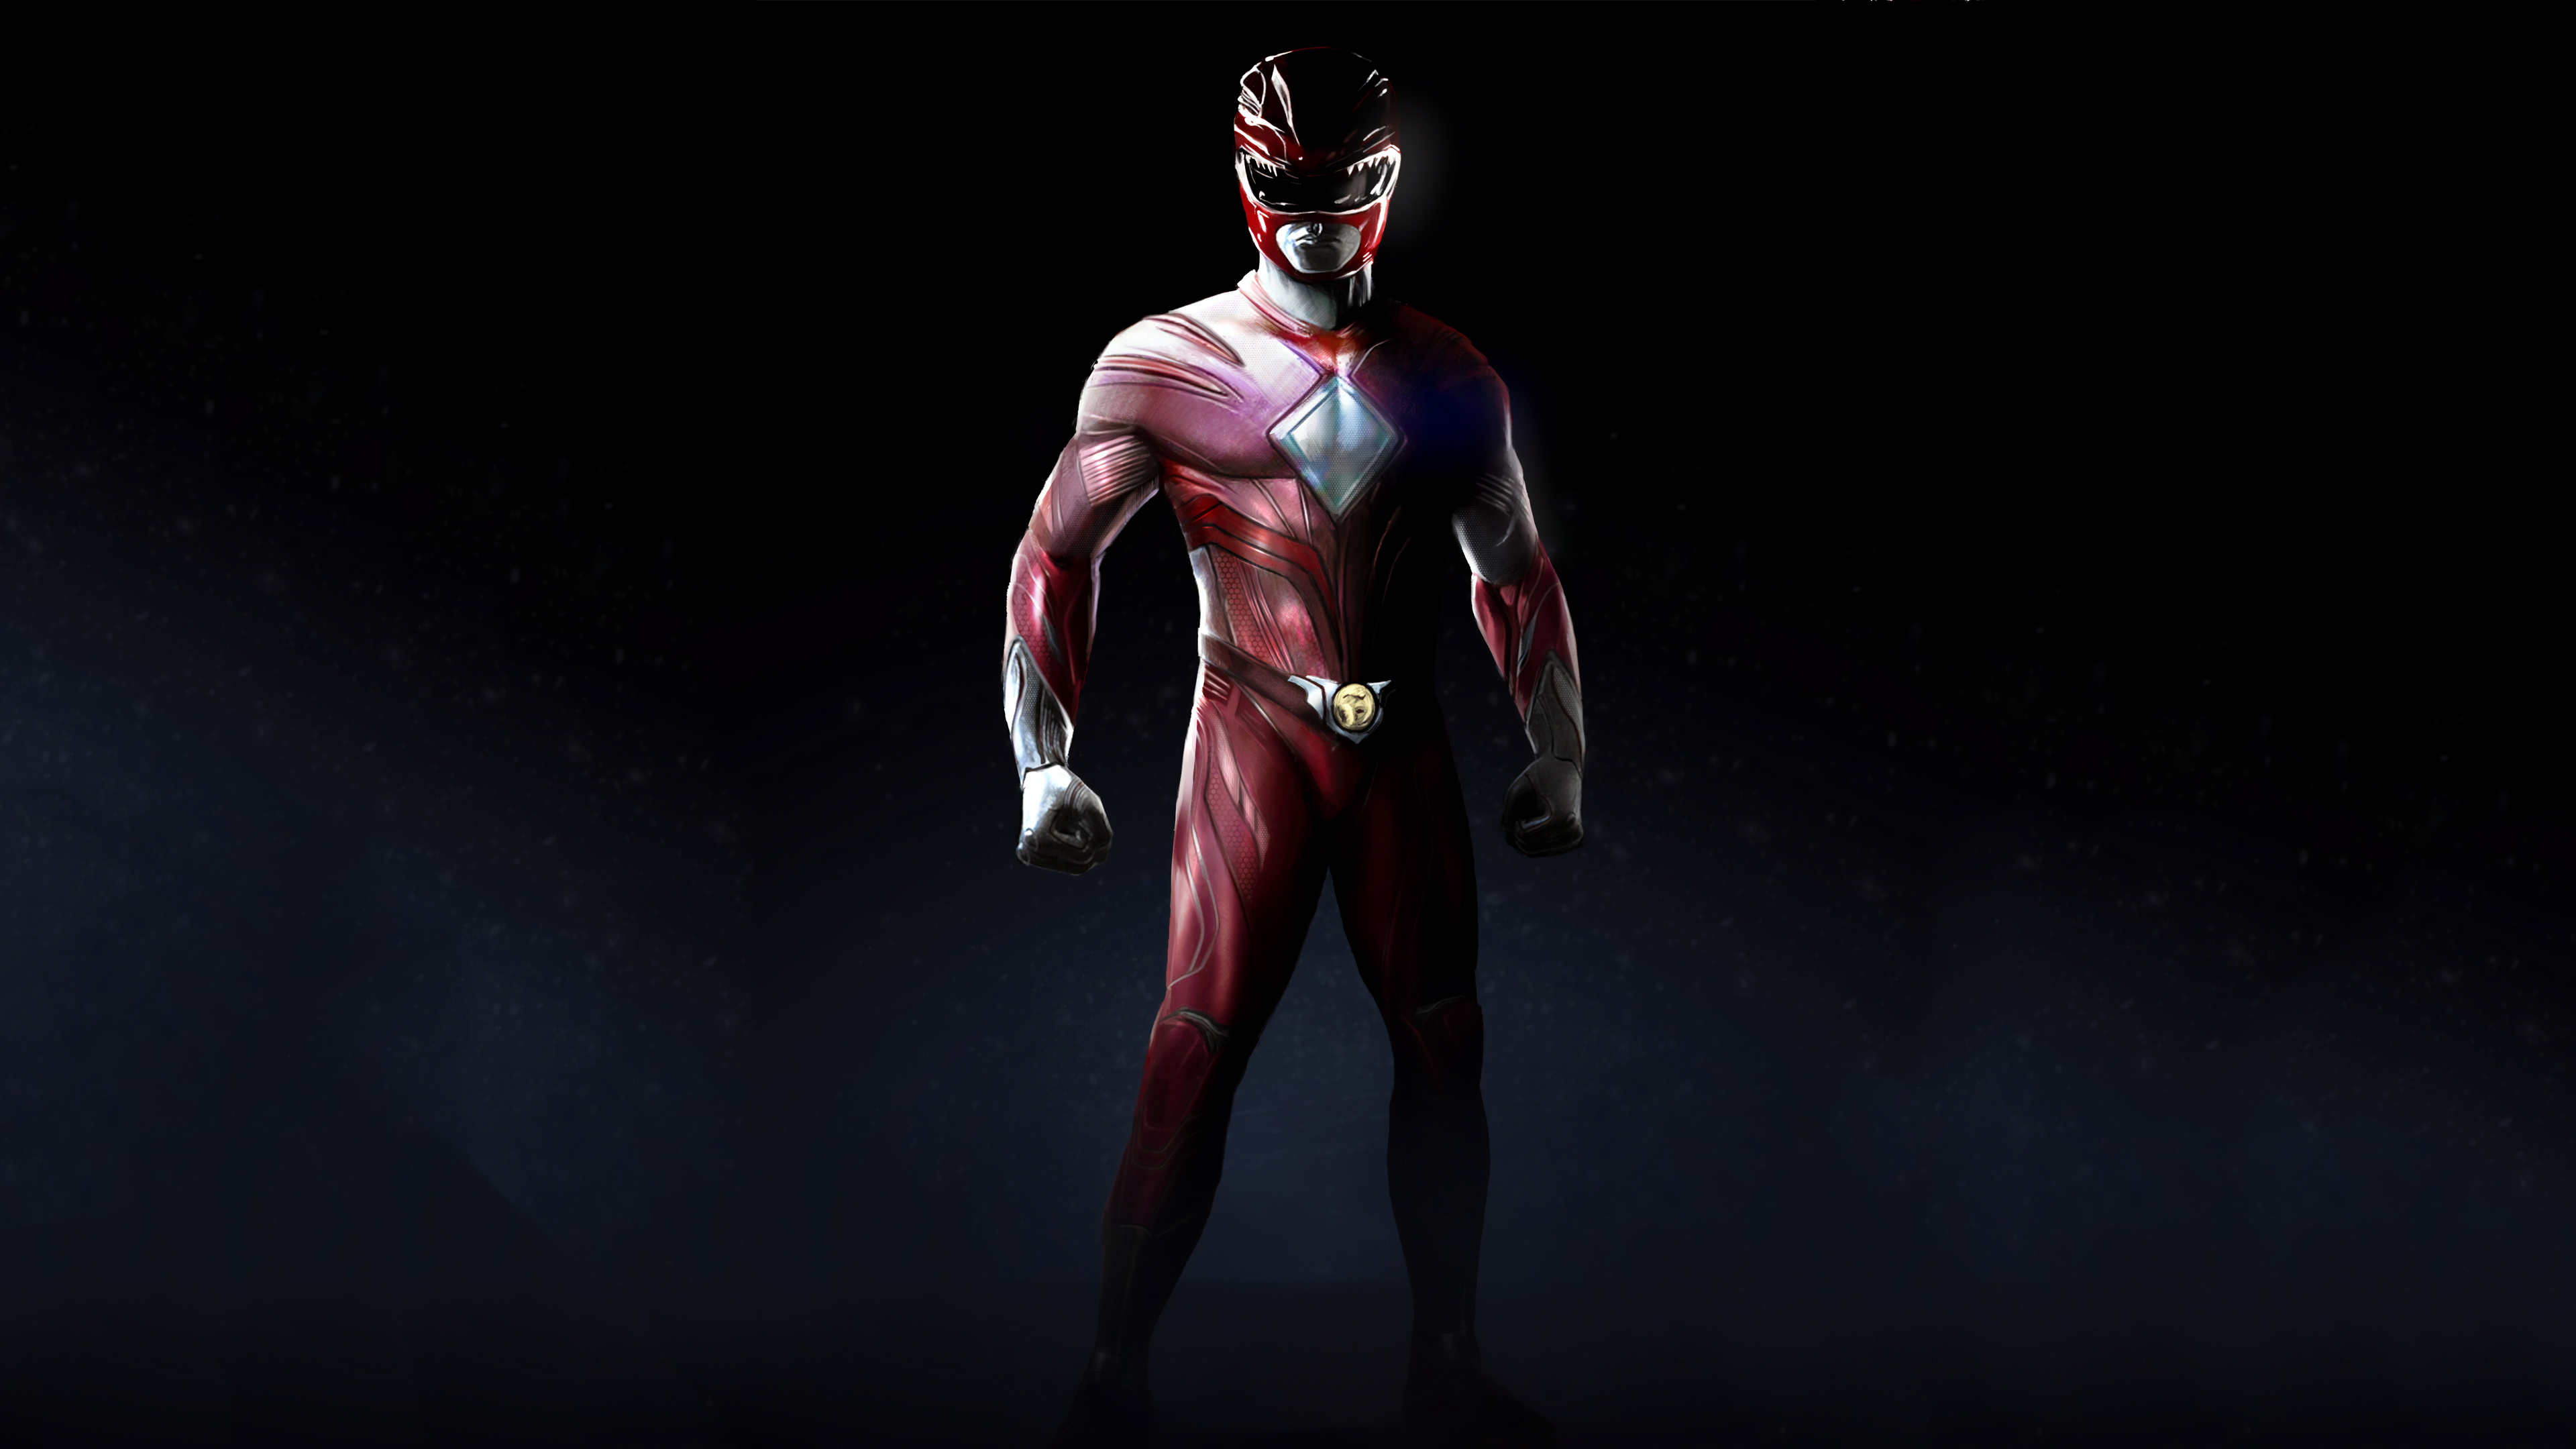 power rangers jason 1570394787 - Power Rangers Jason - superheroes wallpapers, power rangers wallpapers, hd-wallpapers, artstation wallpapers, 4k-wallpapers